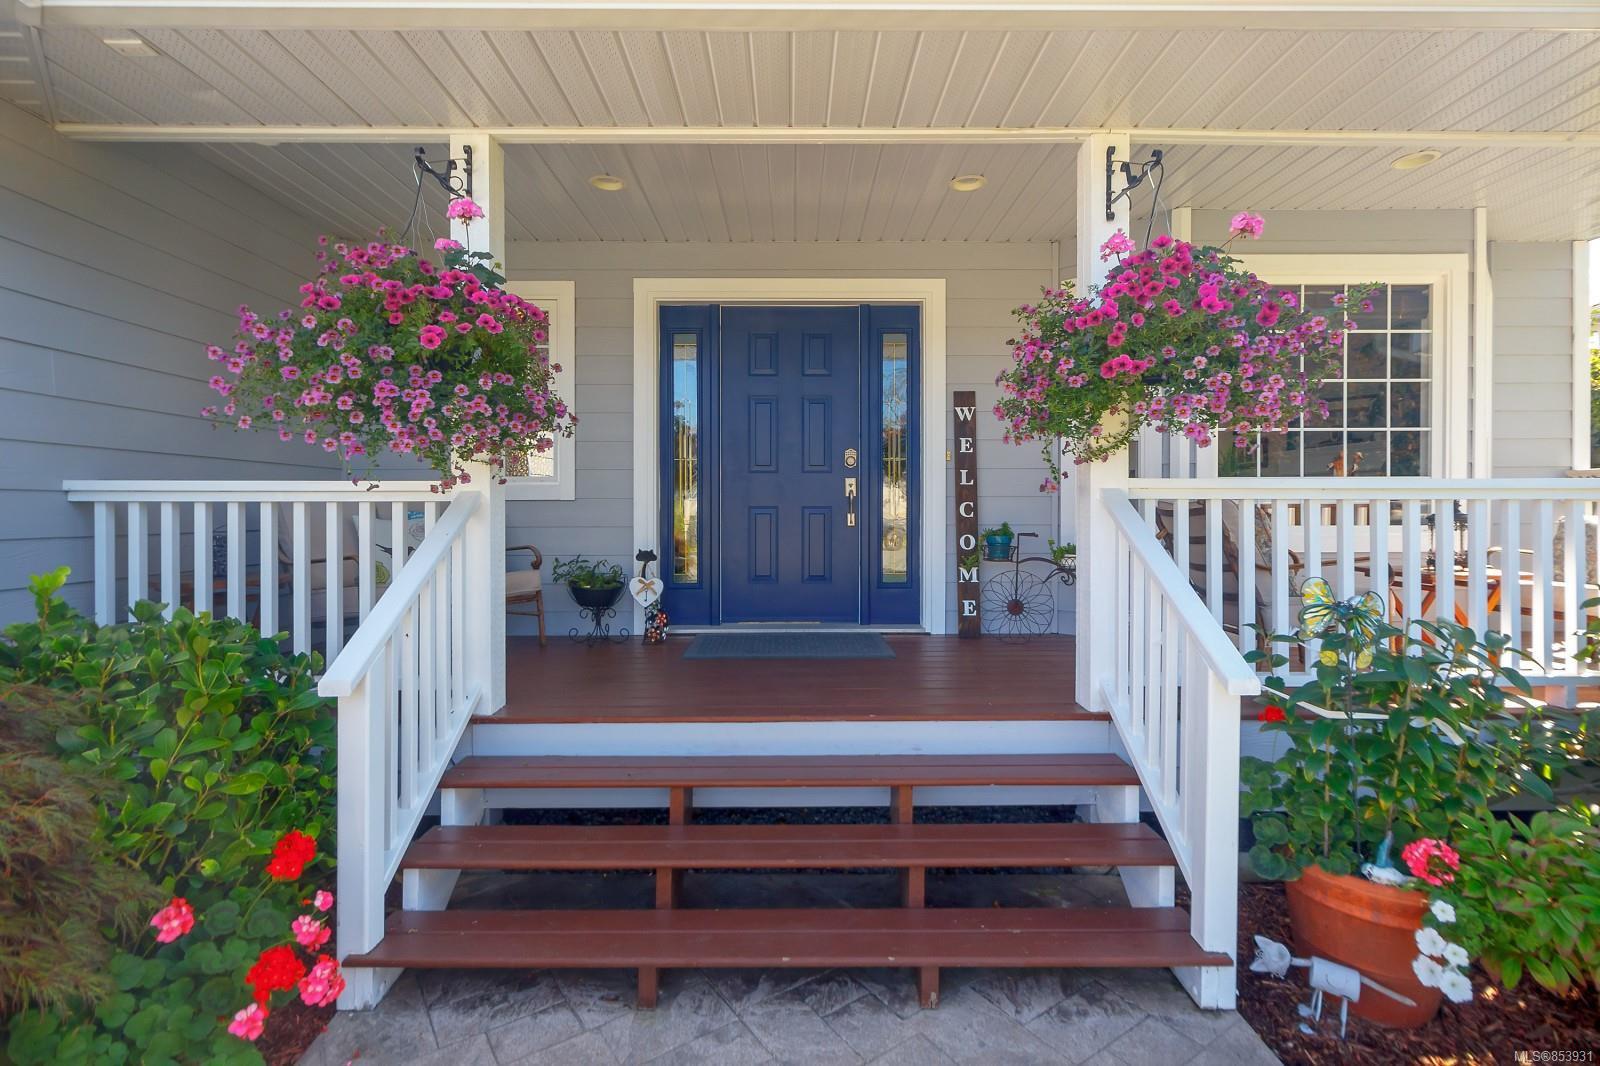 Photo 2: Photos: 2456 Timbercrest Dr in : Du East Duncan House for sale (Duncan)  : MLS®# 853931